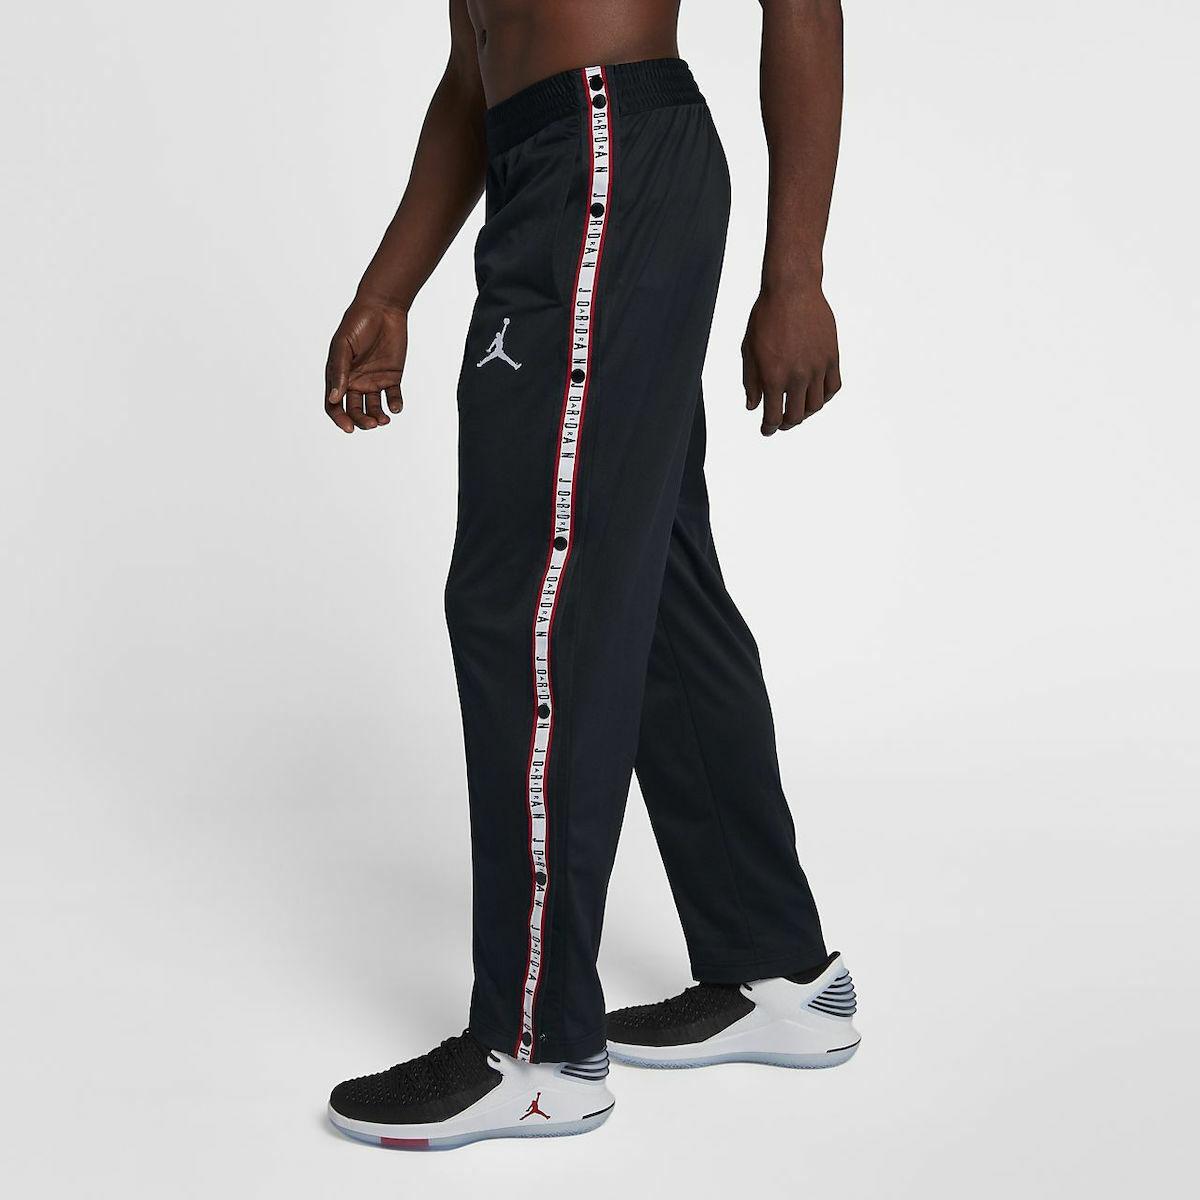 Nike Air Jordan Jordan Jordan Jumpman Basketball Trainieren Pantstrousers Böden Schwarz   429096